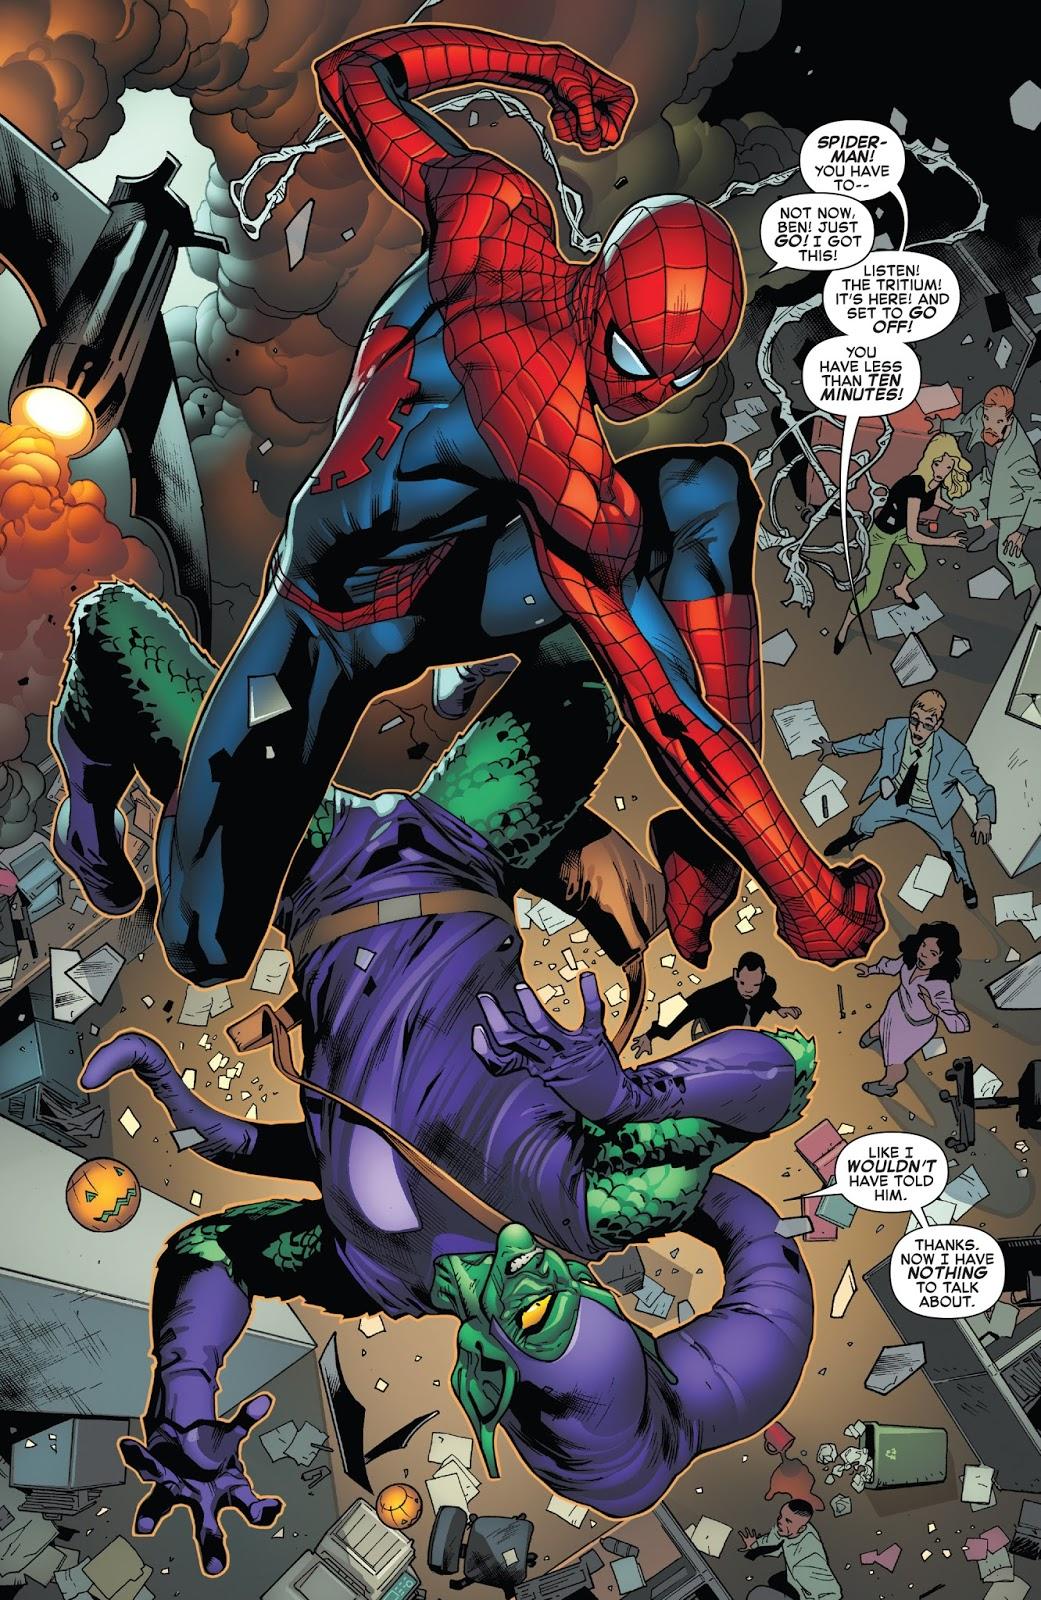 Spider-Man And Green Goblin (Amazing Spider-Man Vol 1 #798